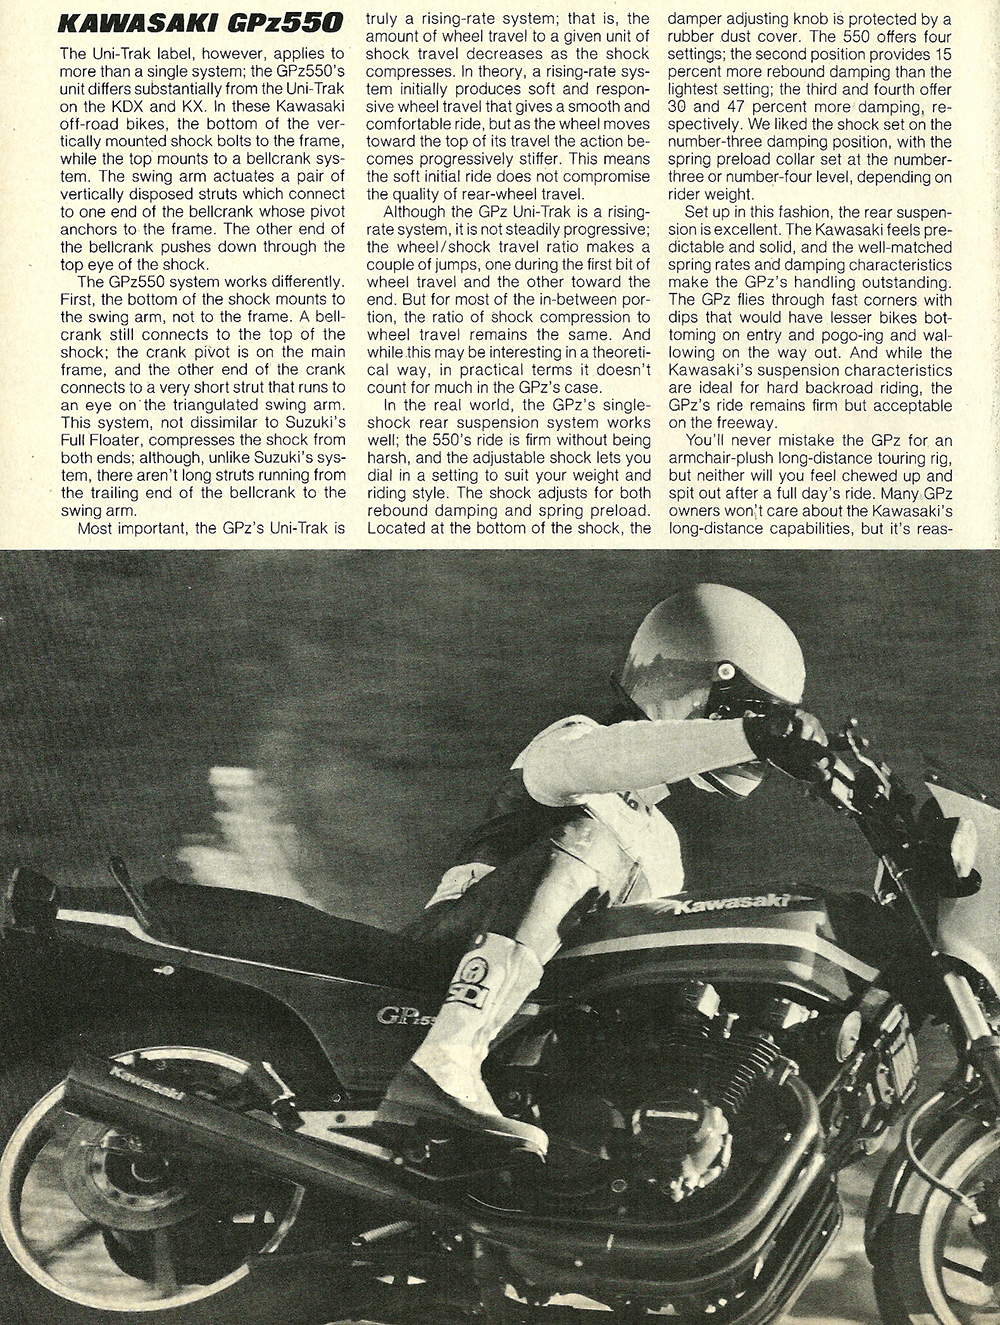 1982 Kawasaki GPz550 road test 03.jpg